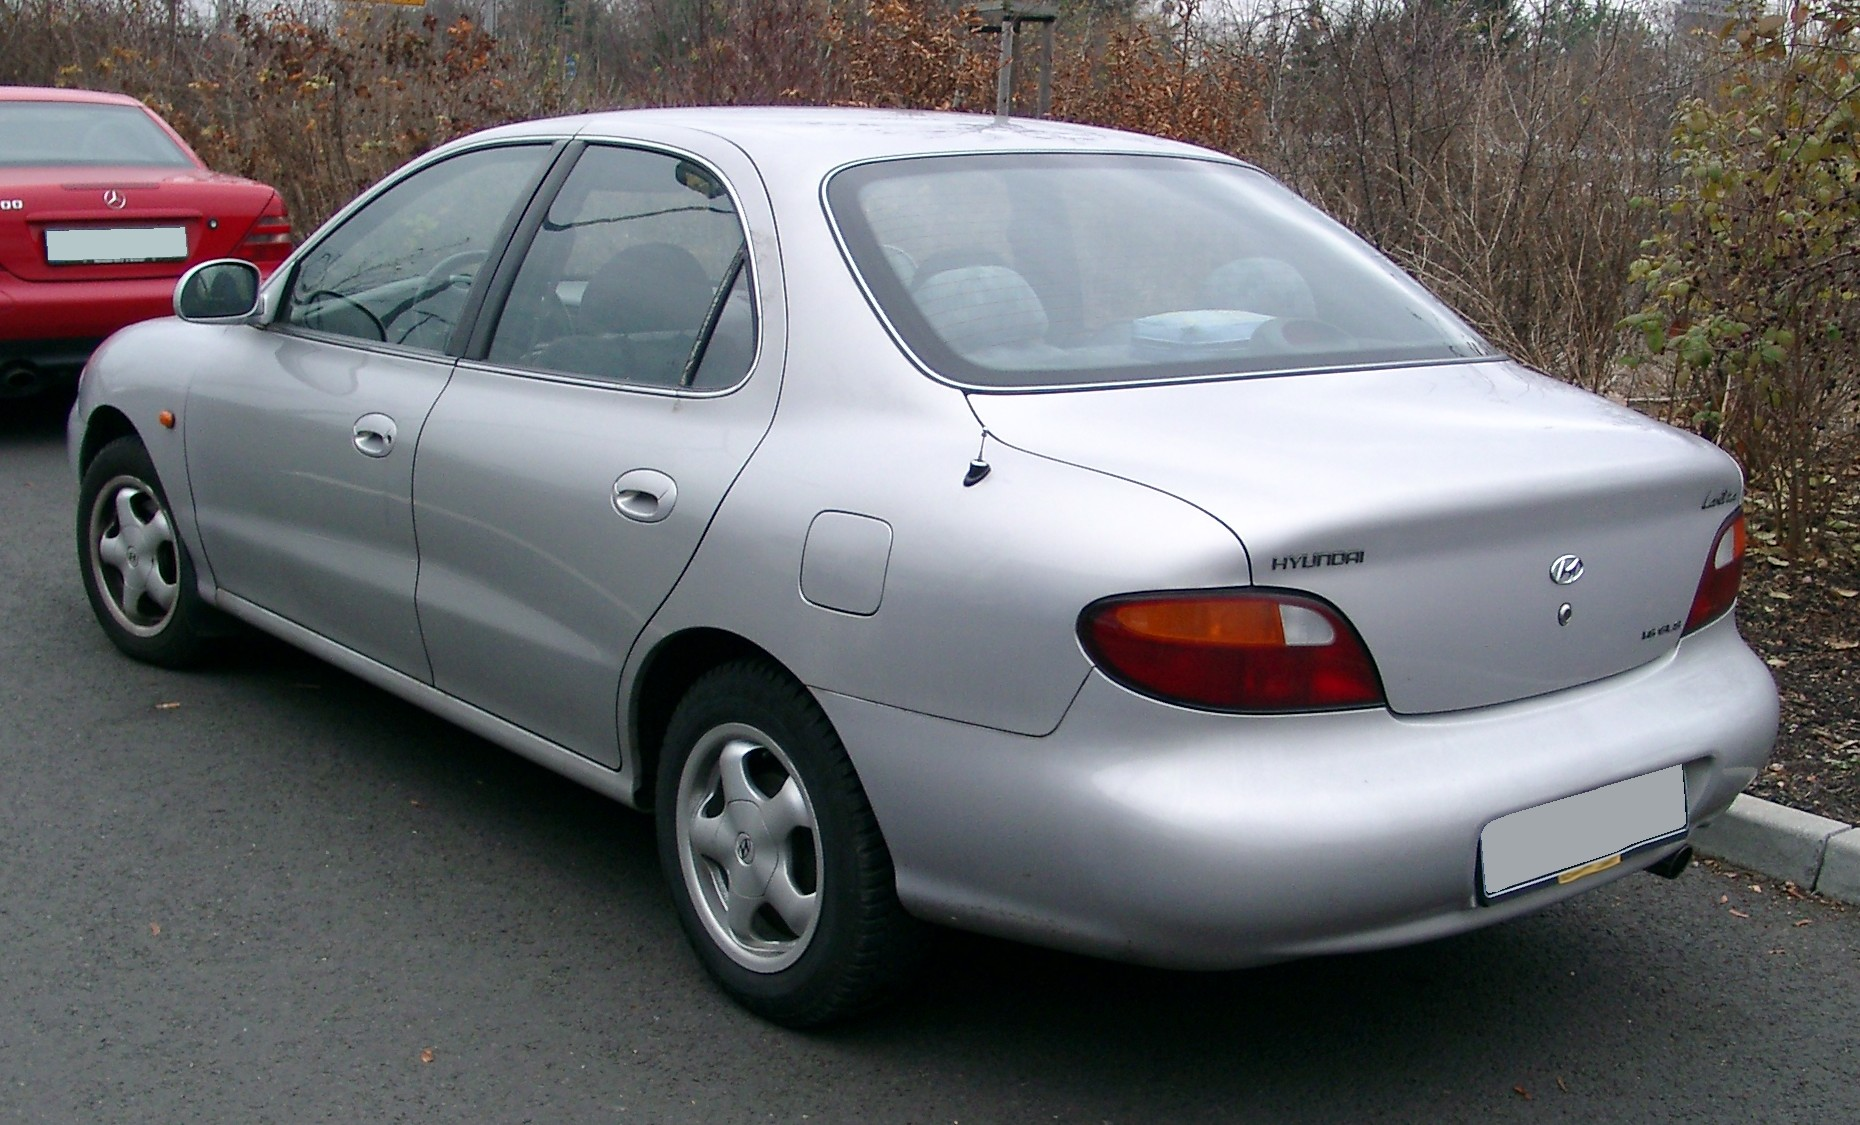 File Hyundai Lantra Rear 20071119 Jpg Wikimedia Commons